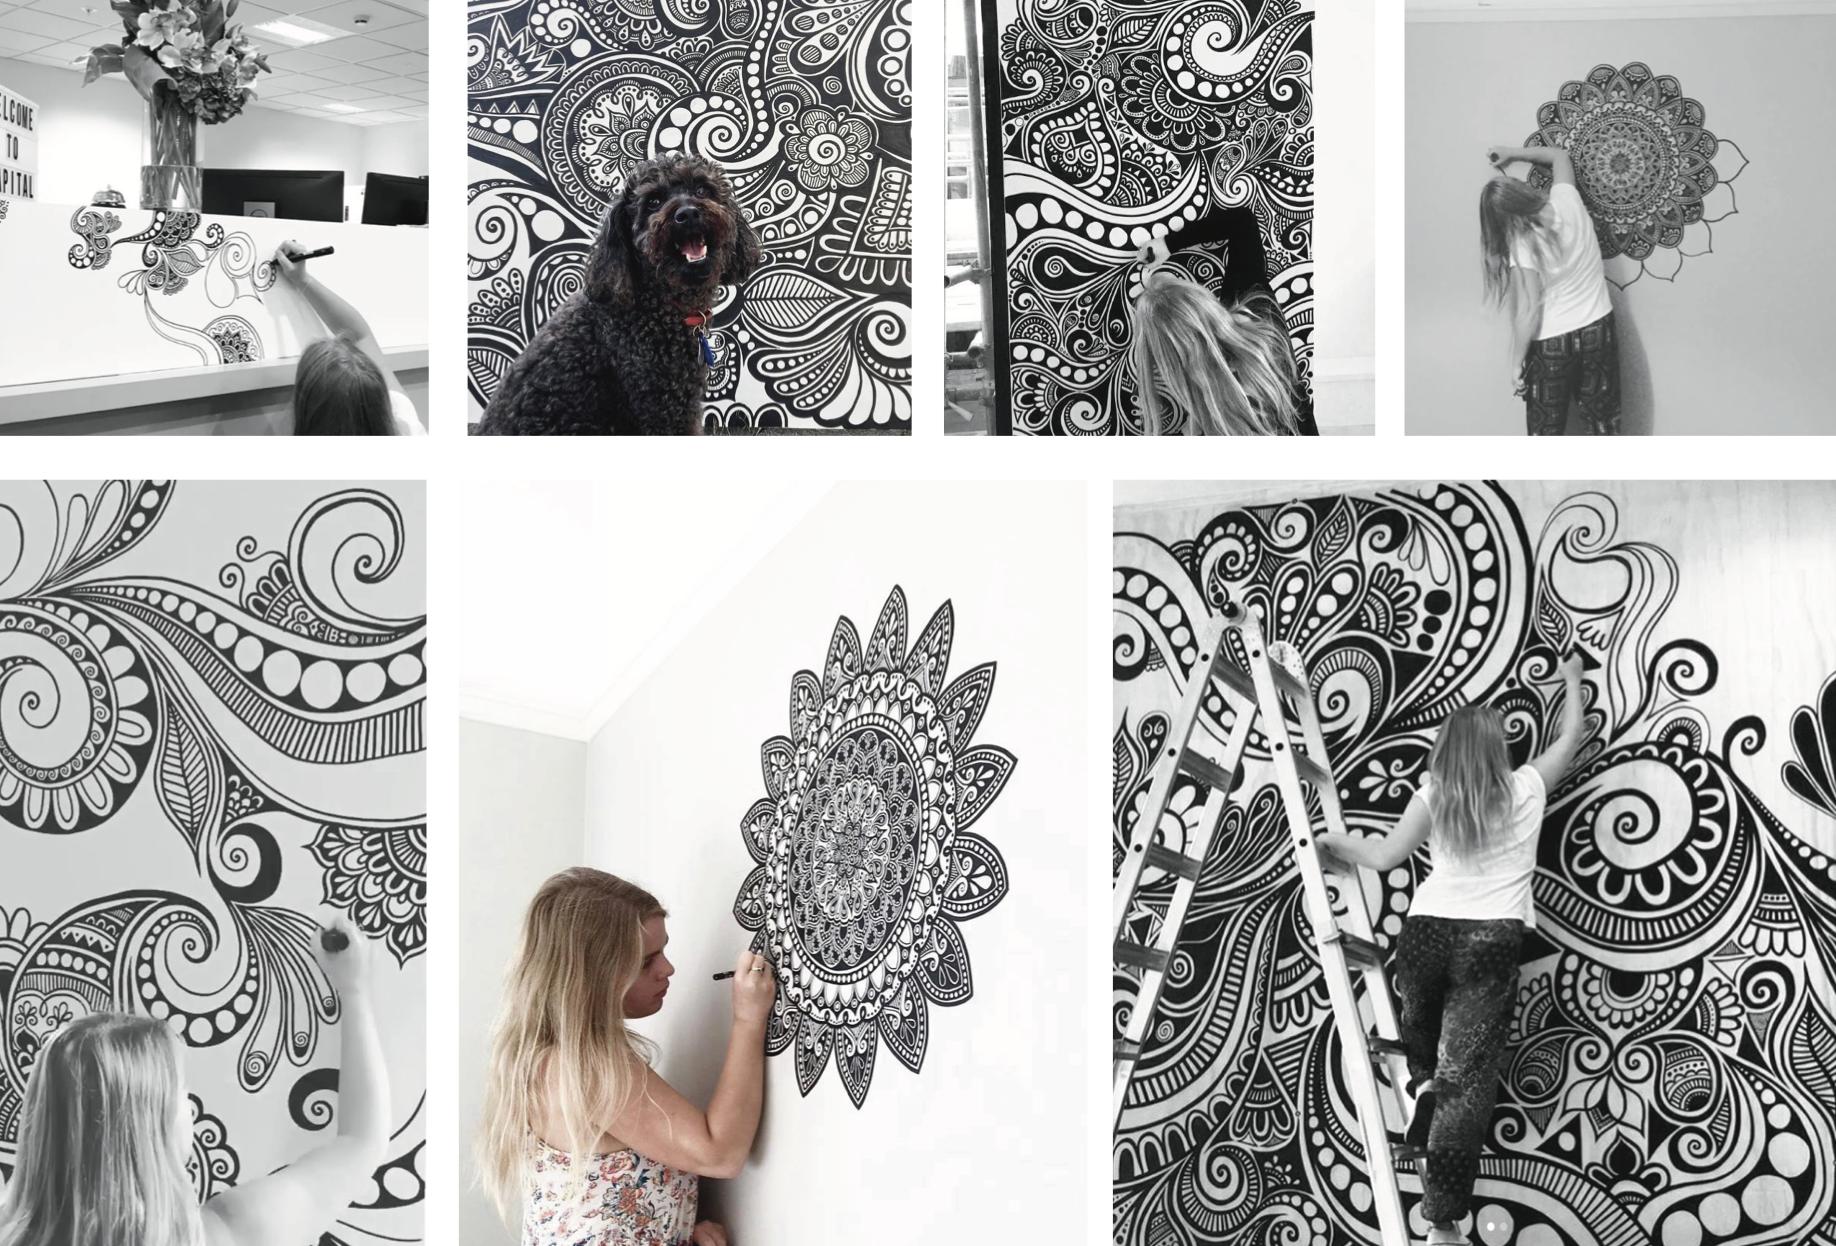 fortyonehundred_ArtistCV_NZartist_Mandalas_Murals.png